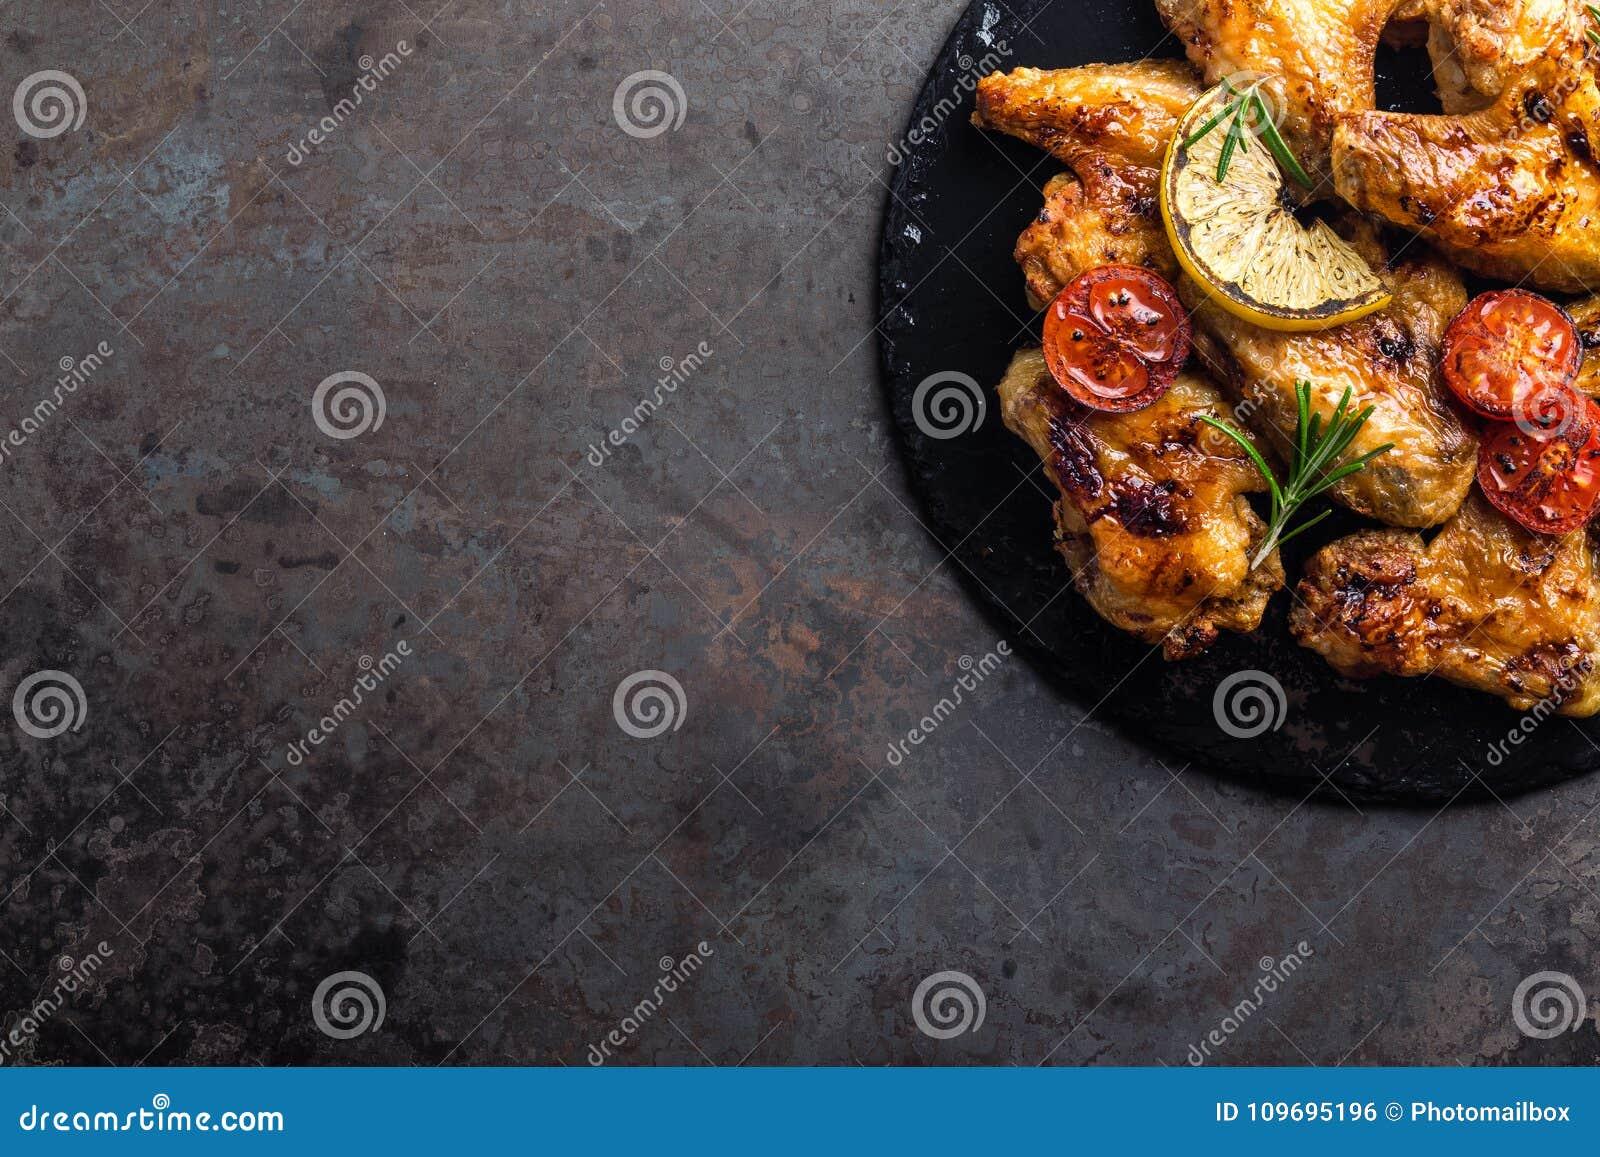 BBQ φτερά κοτόπουλου, πικάντικο ψημένο στη σχάρα κρέας